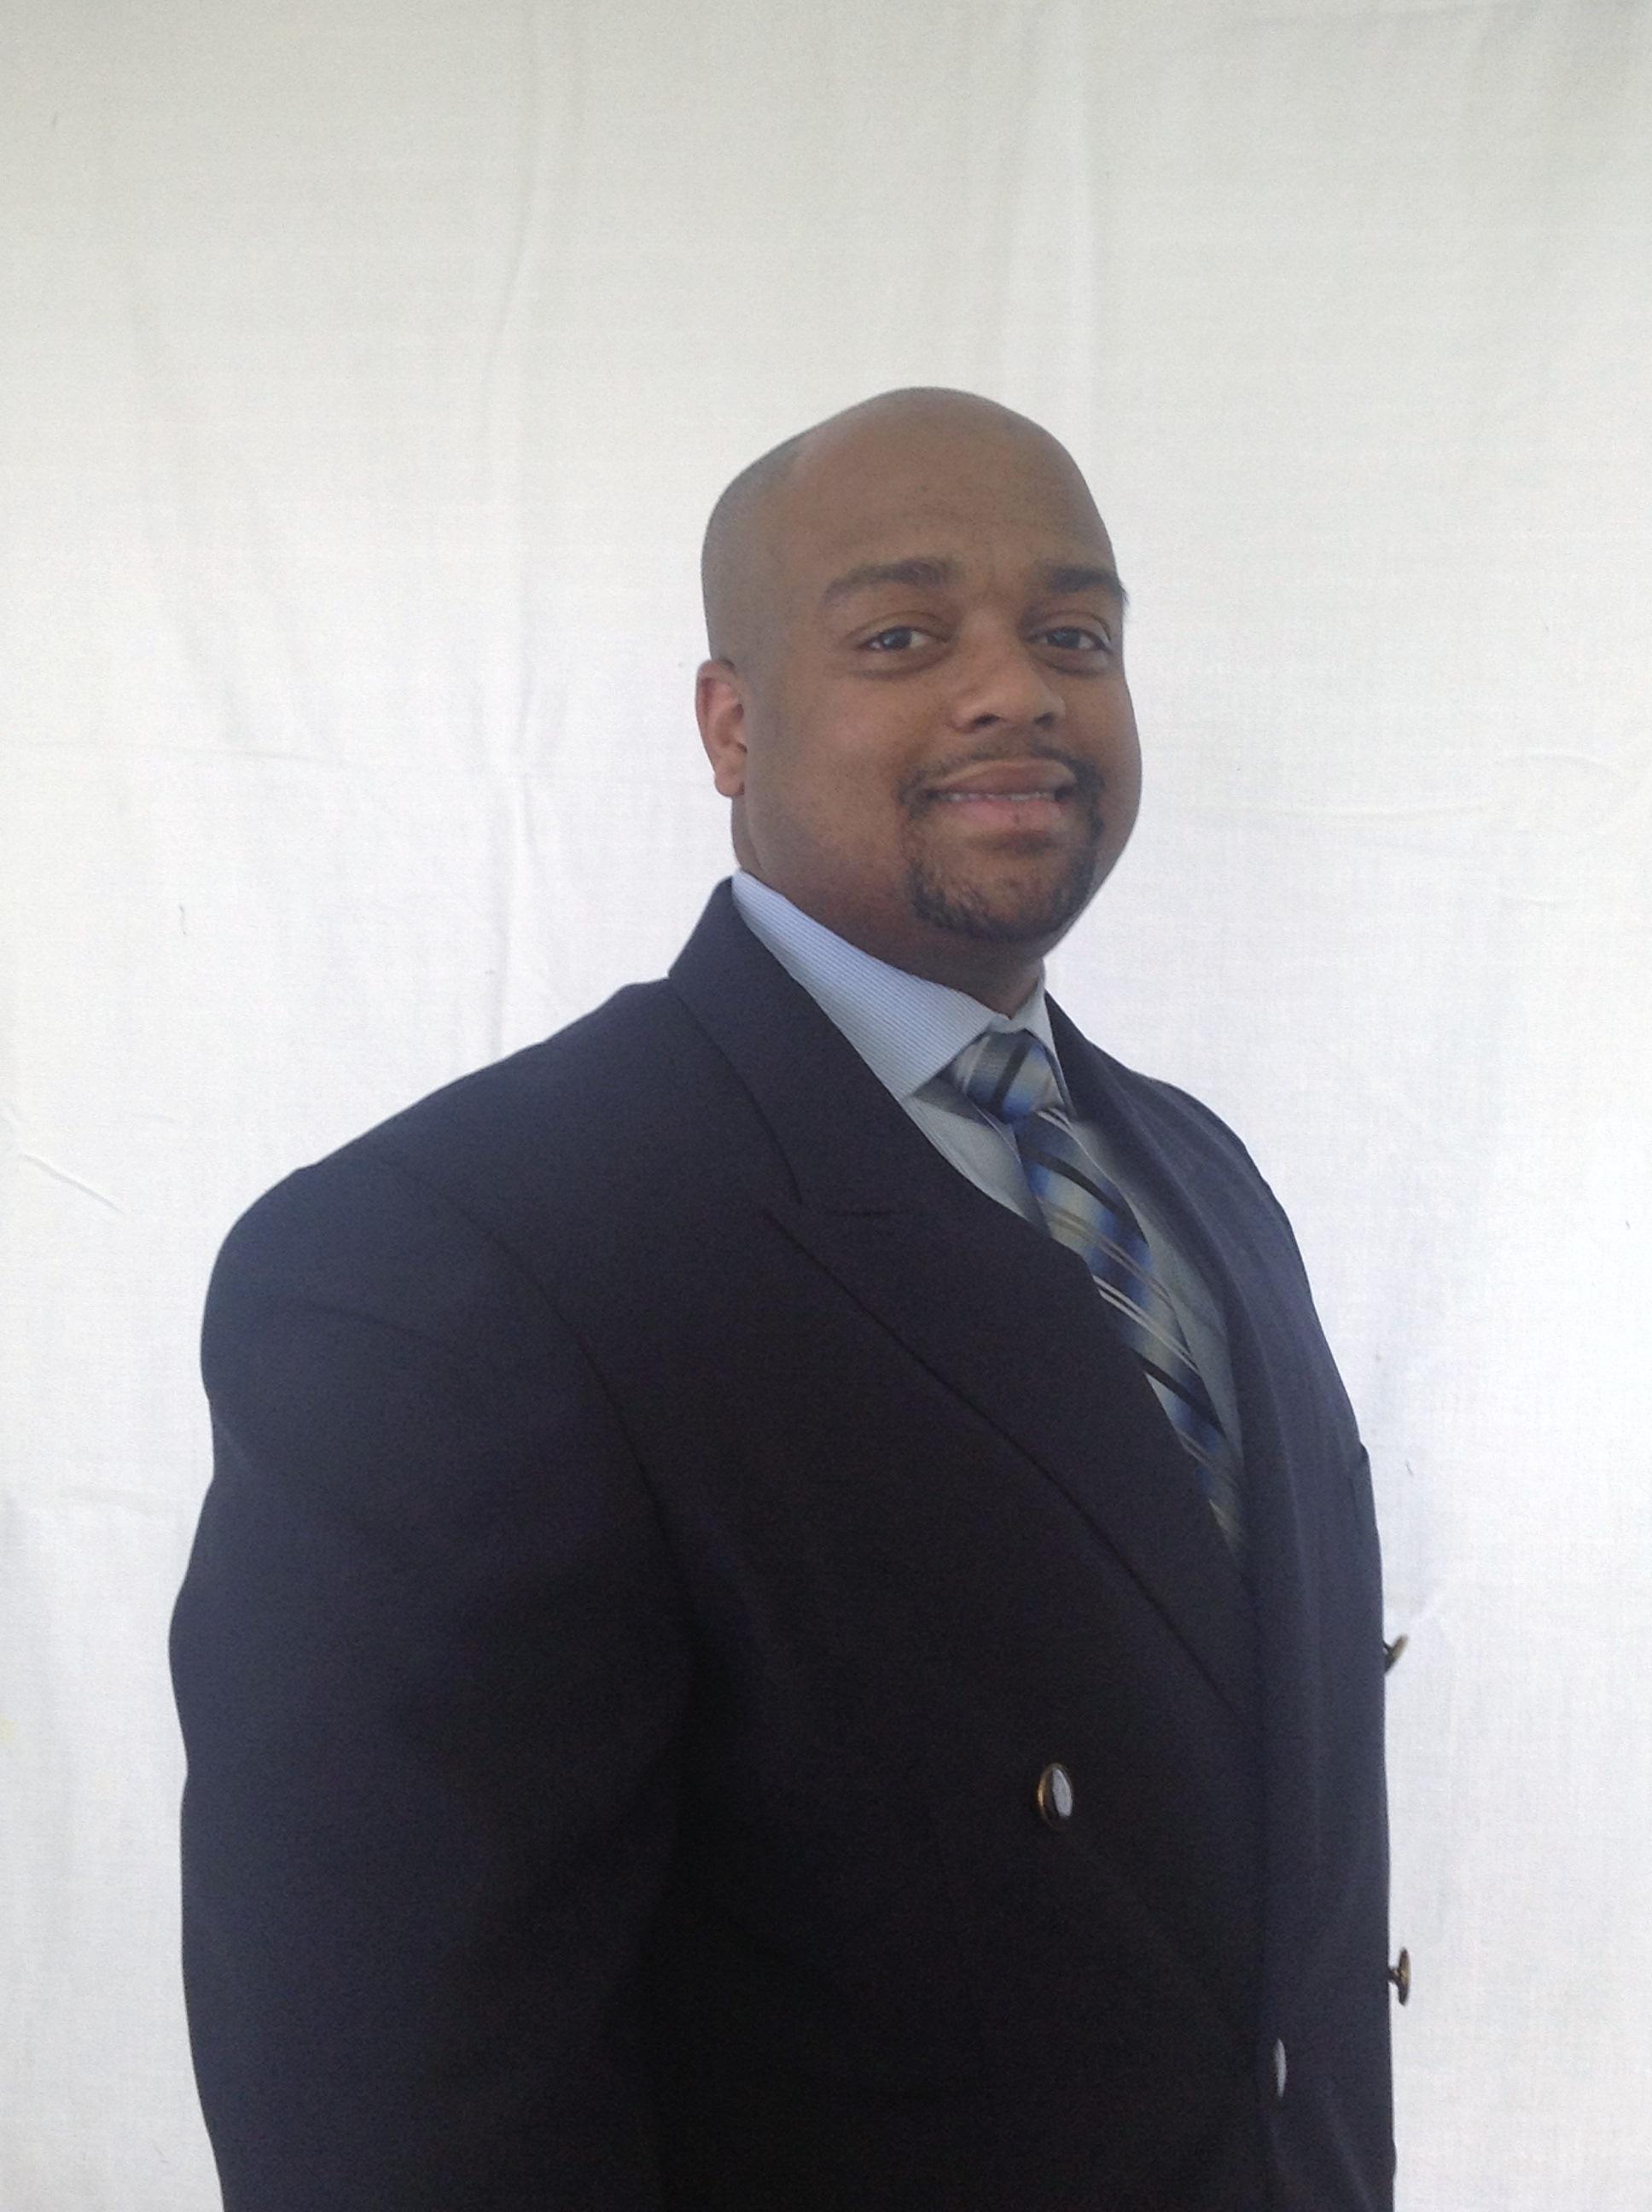 Michael T Bland